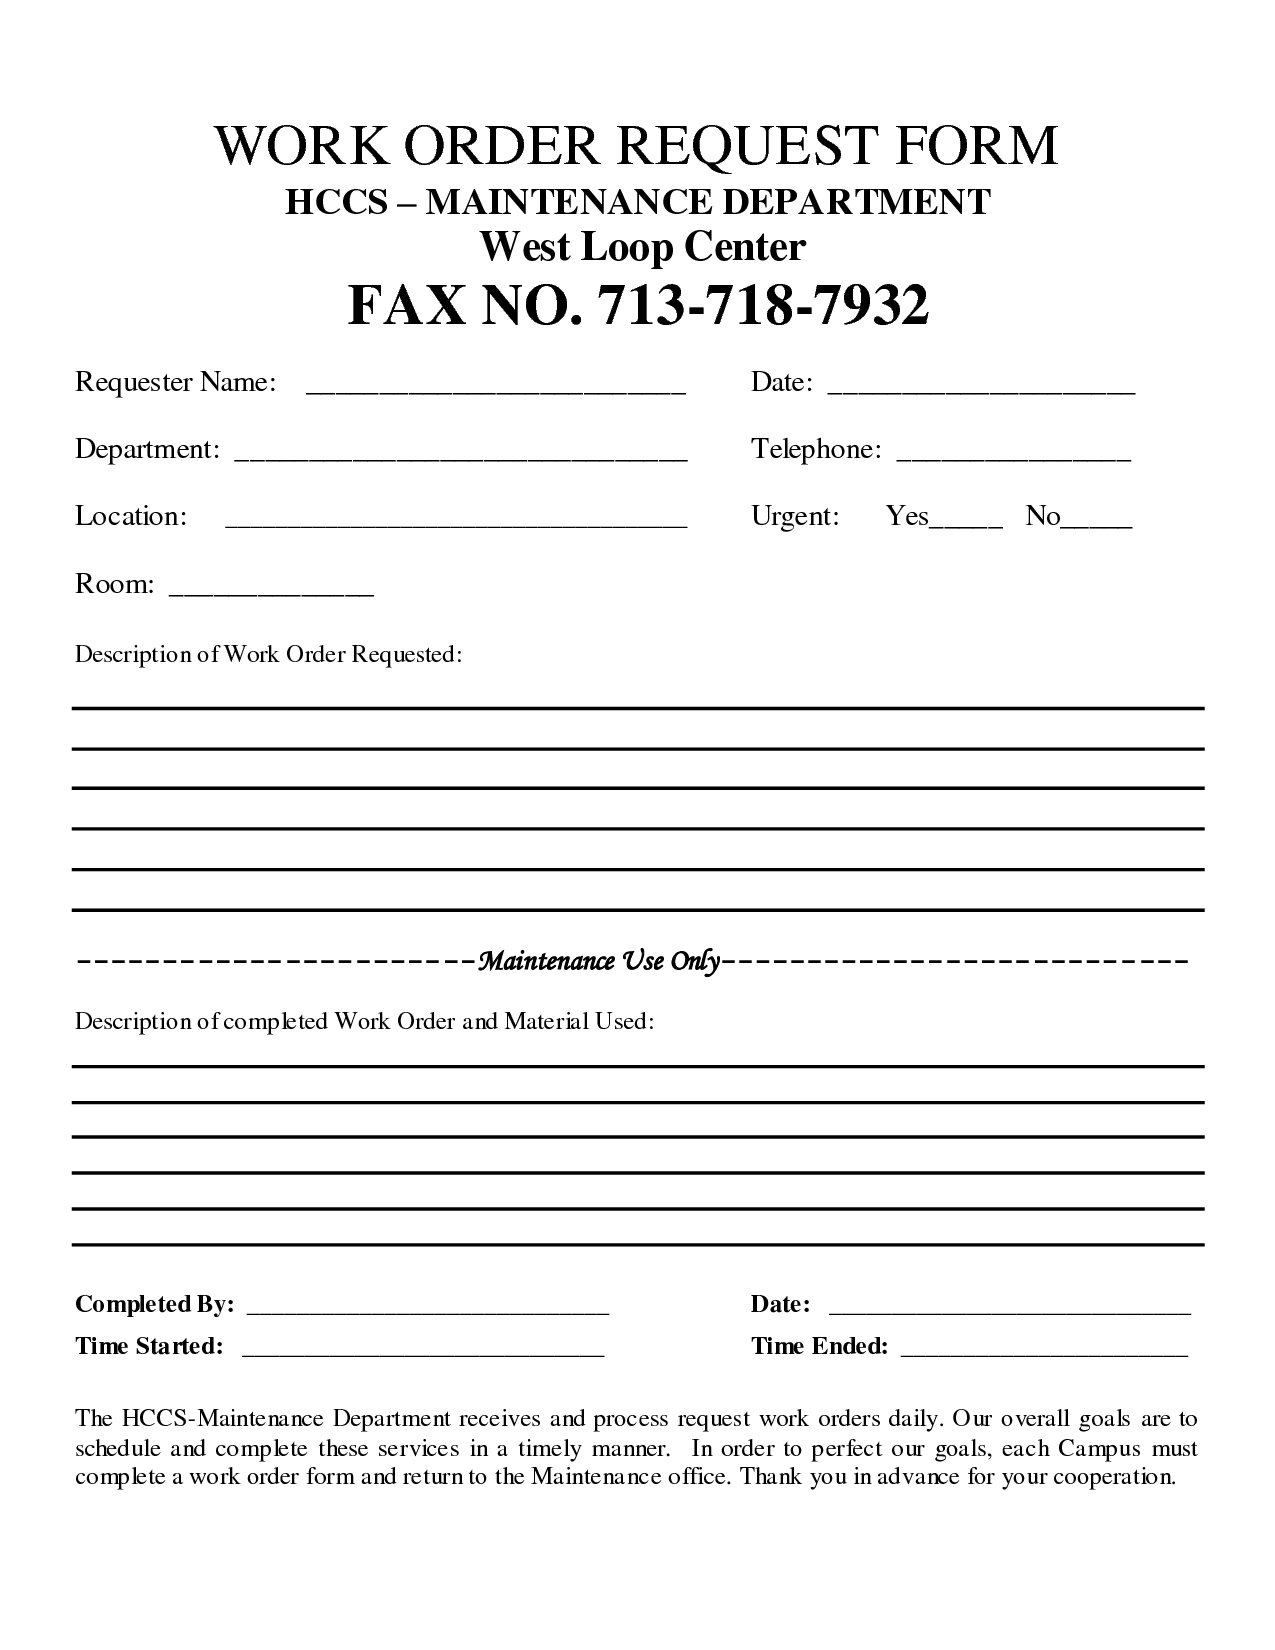 Free Customer Work Order Request Work Order Form